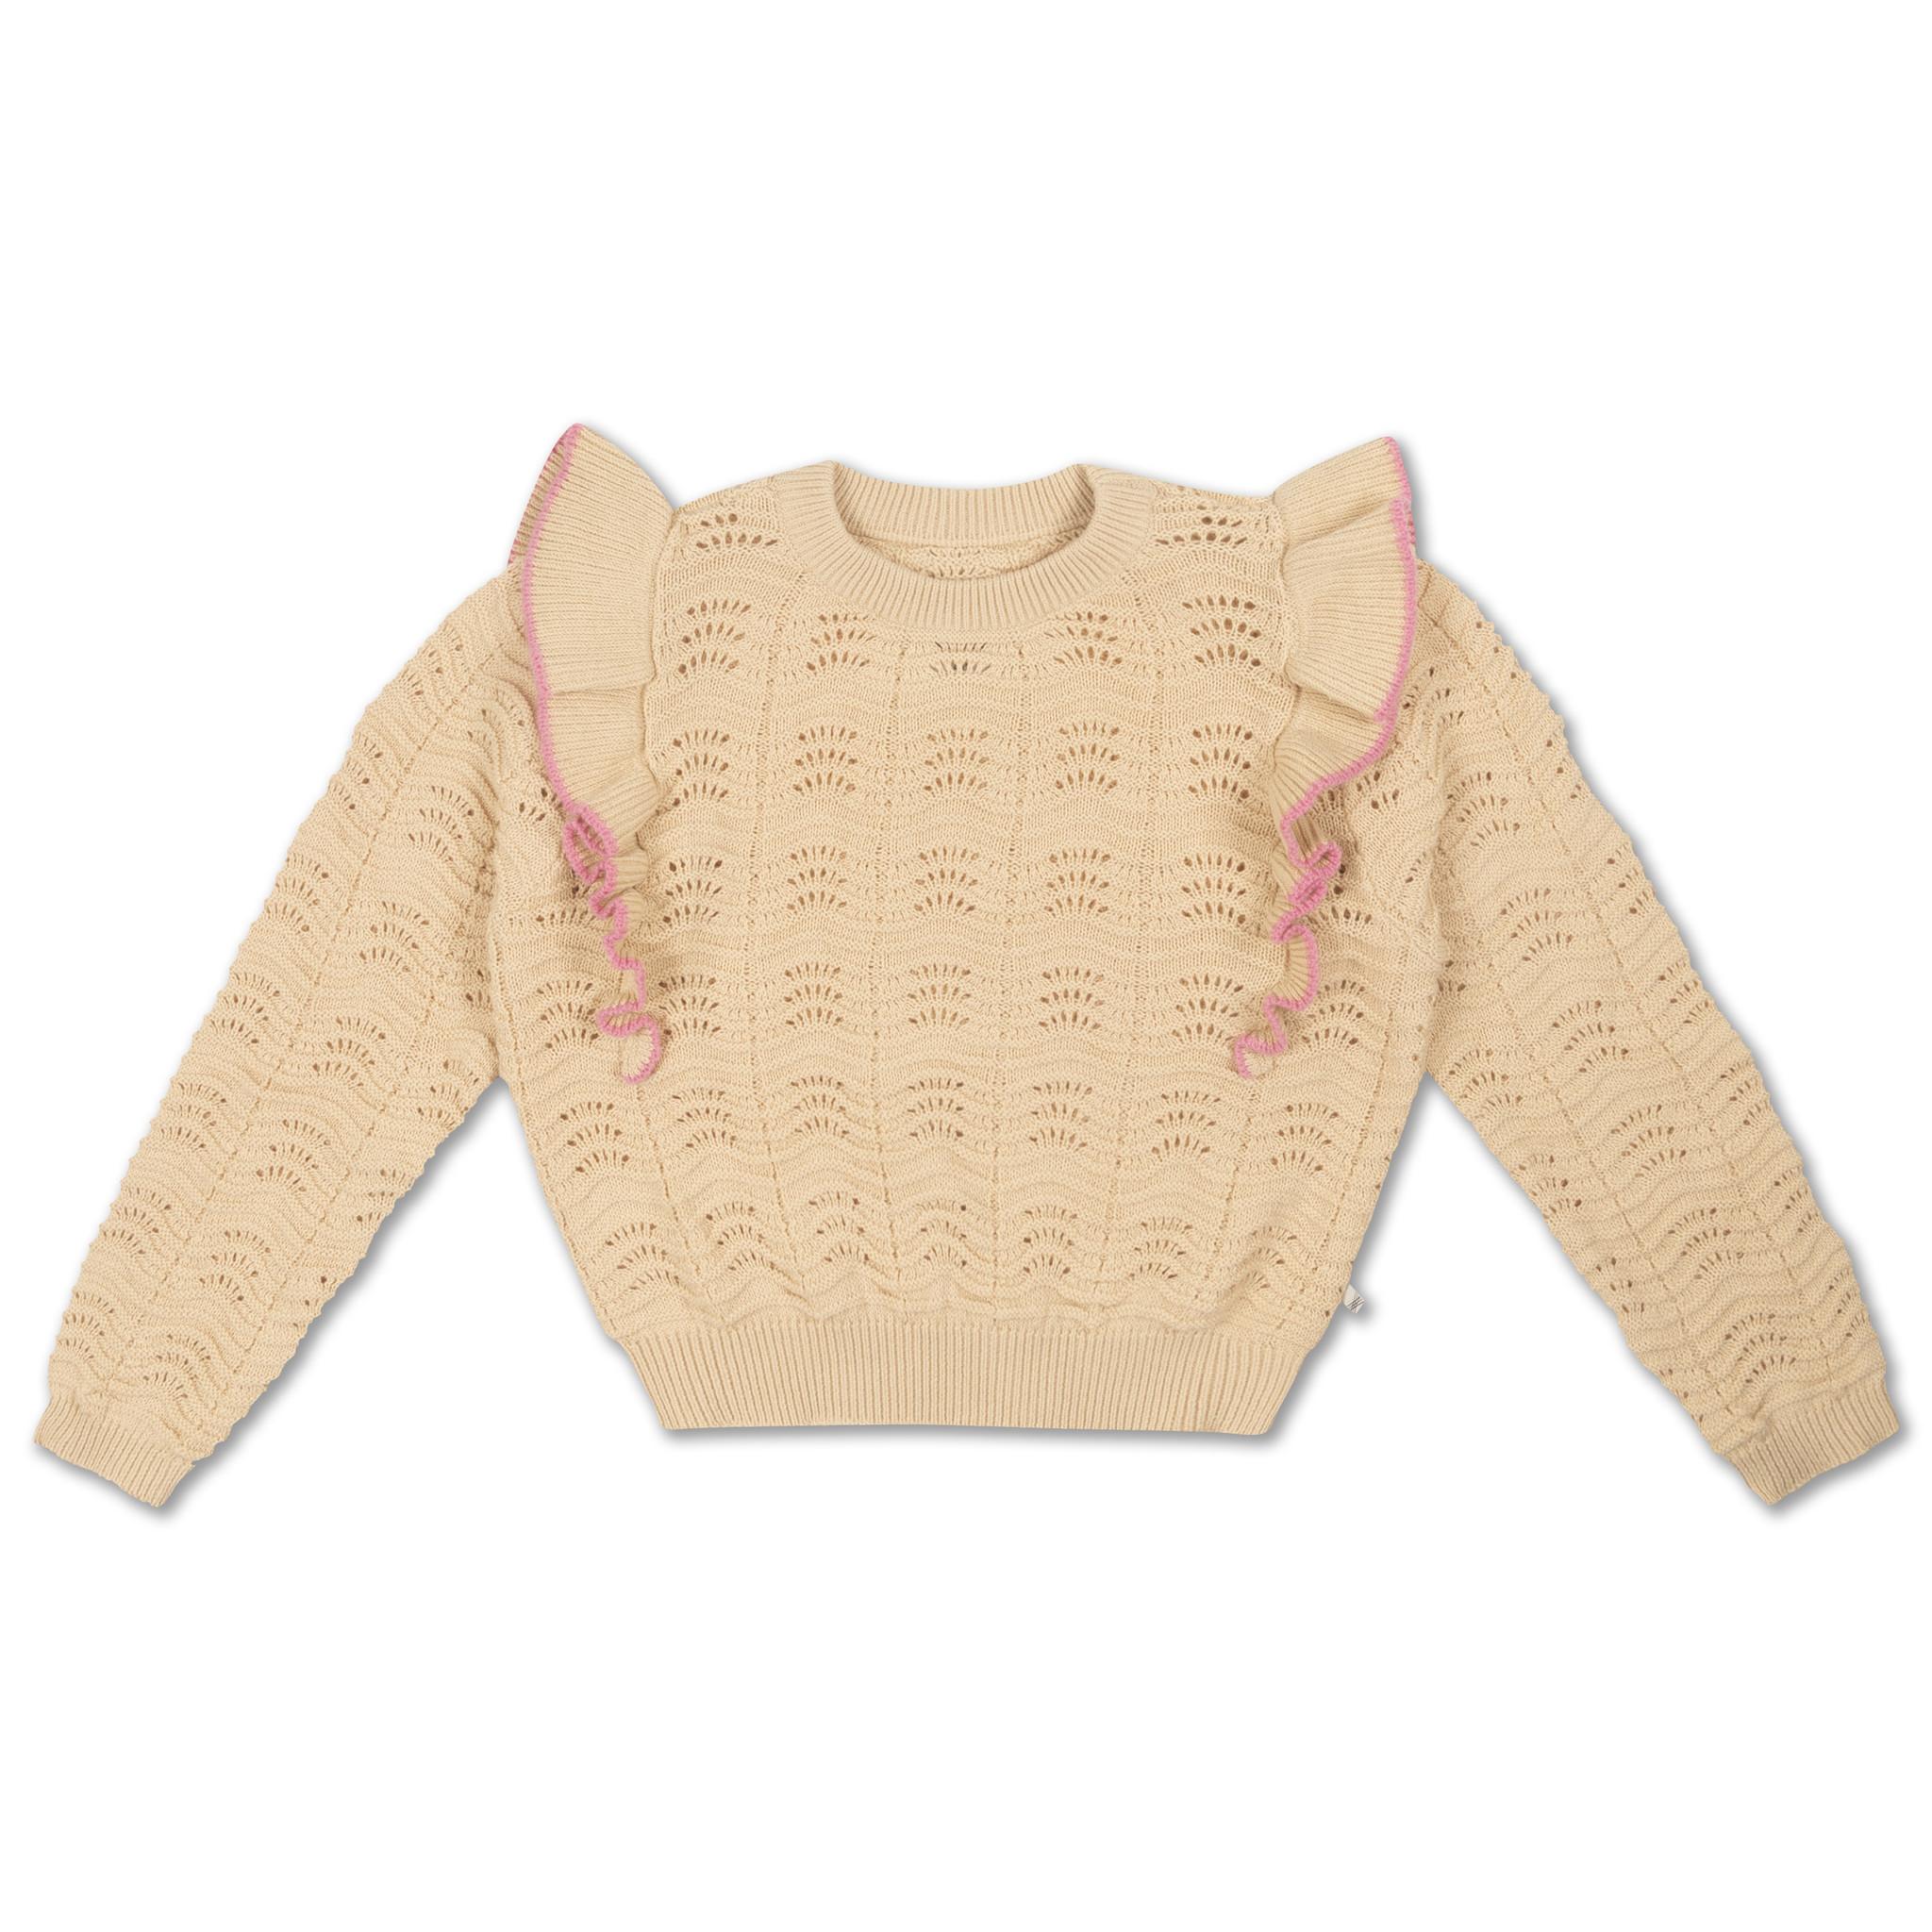 Knit sweater - Vintage White-1